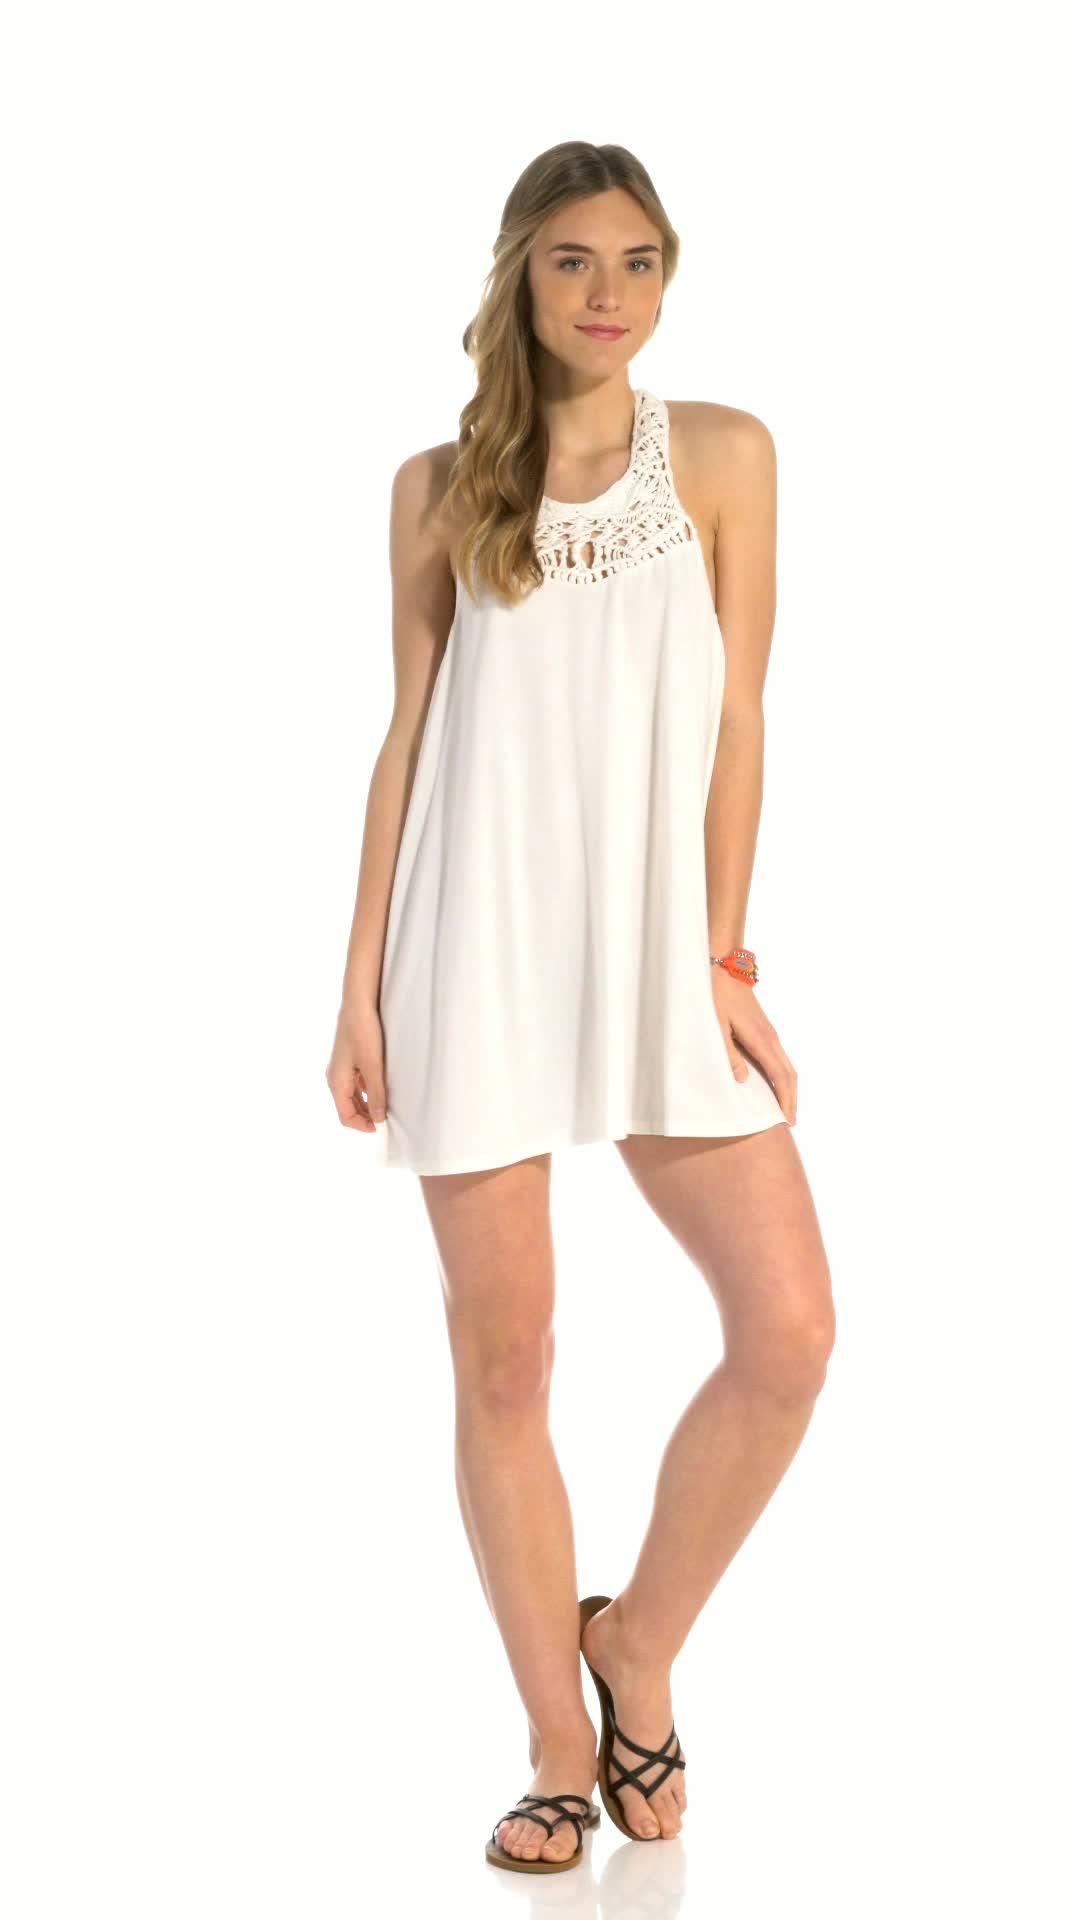 claire gerhardstein, model, modeling, swimsuit, Billabong Easy Show Knit Dress GIFs